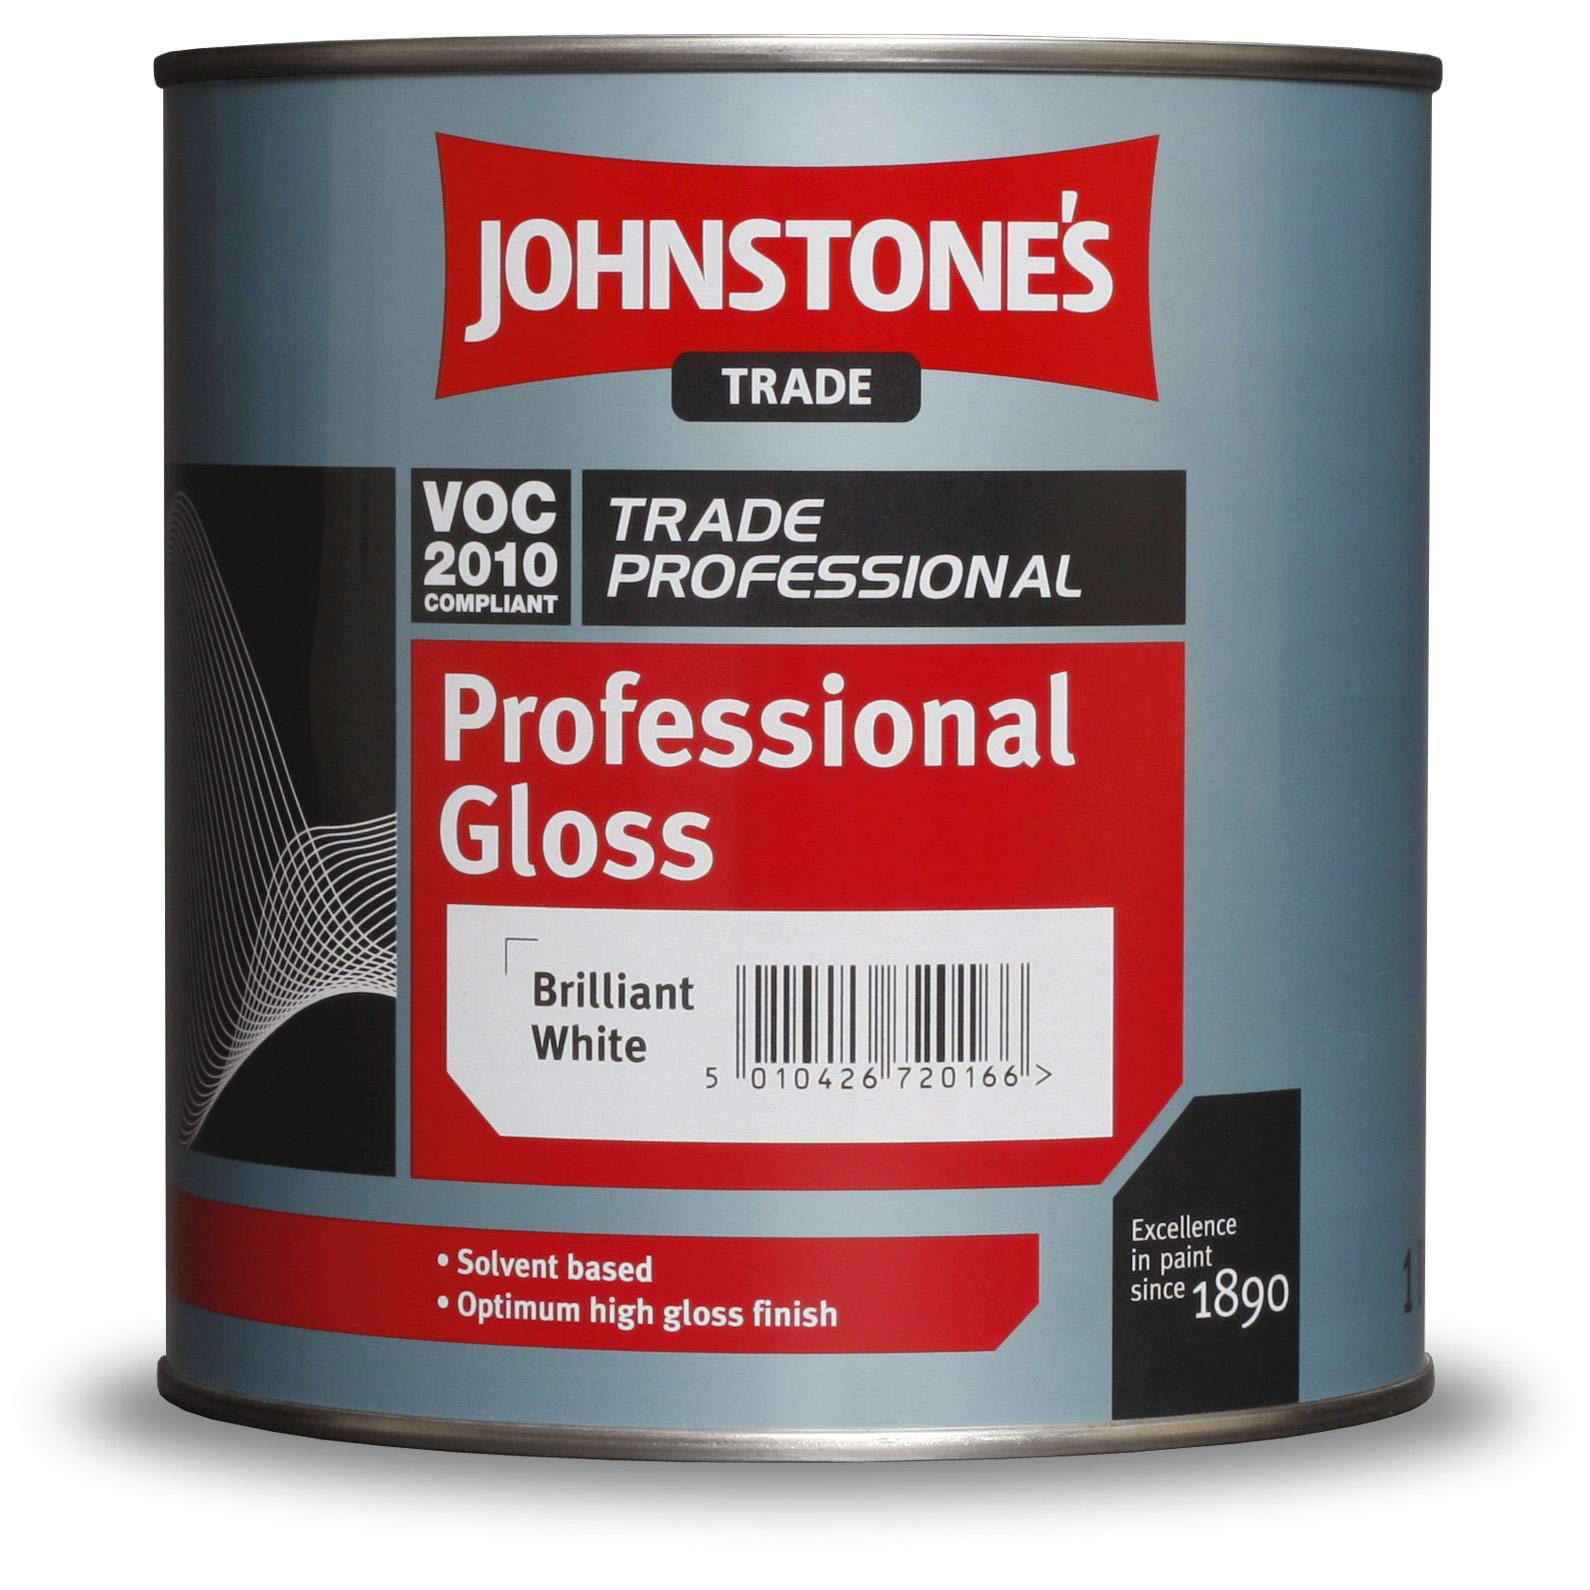 Johnstones_Professional_Gloss6